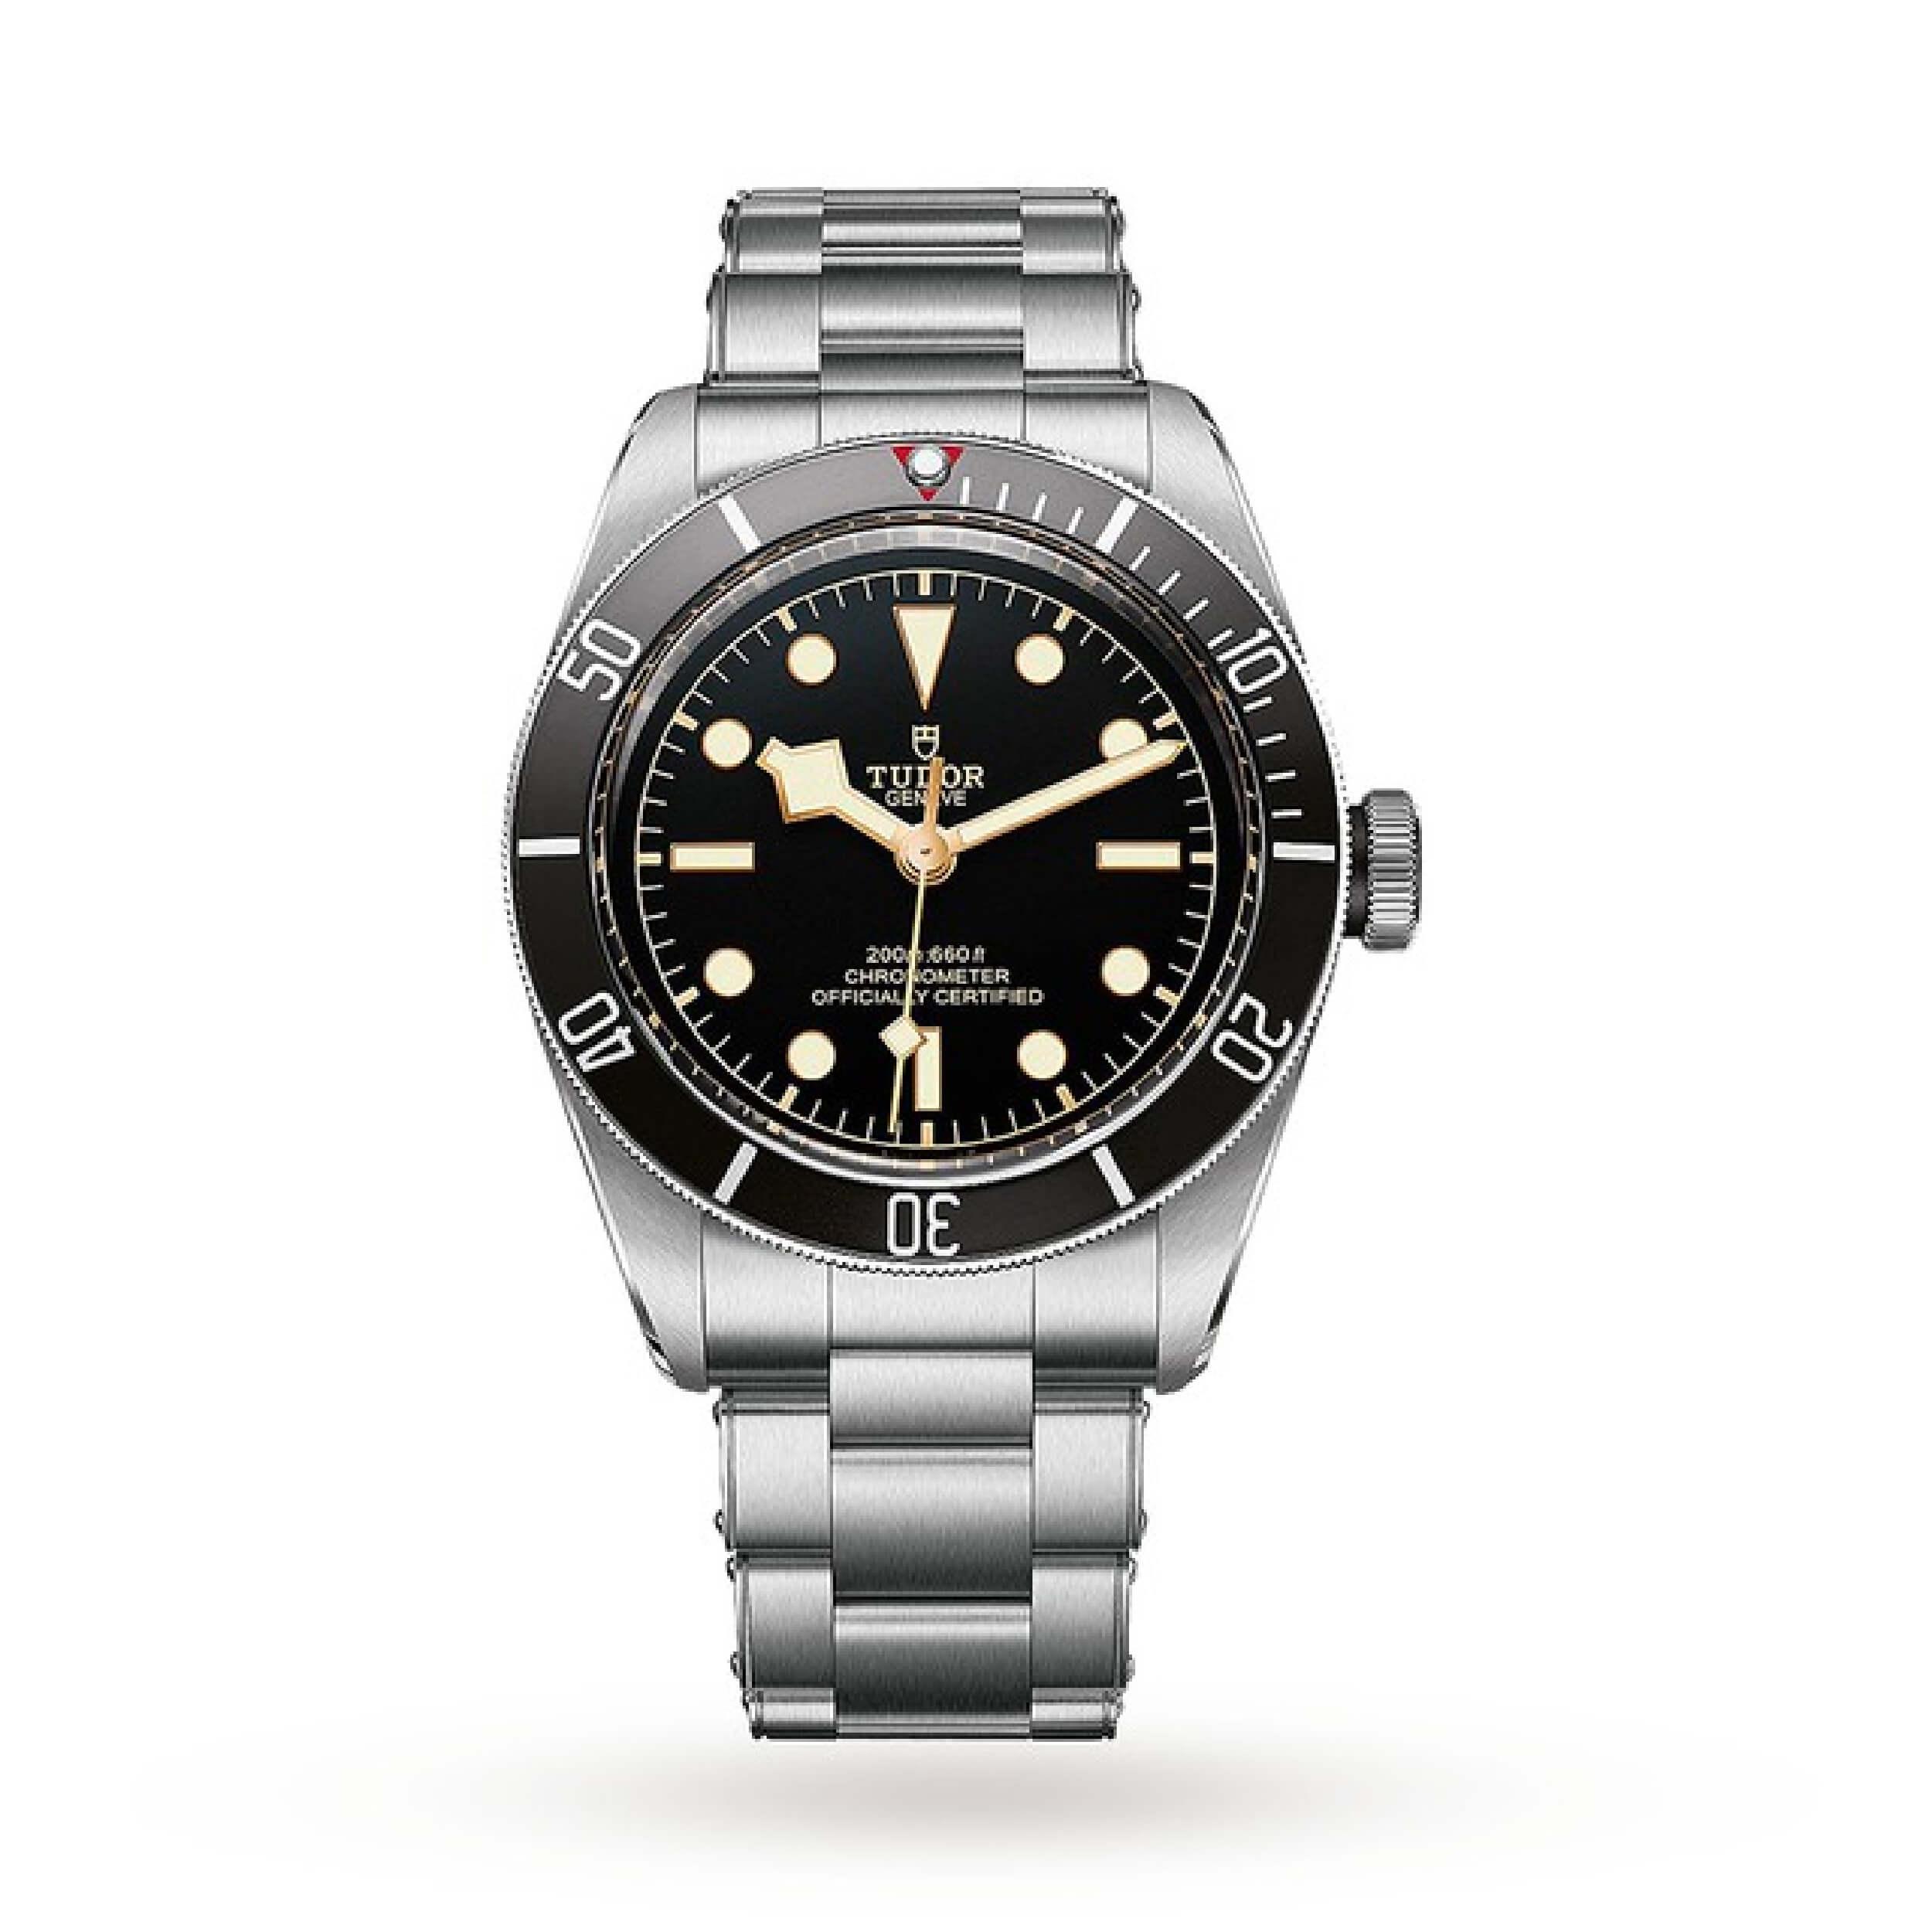 Tudor Black Bay | Wristwatches360